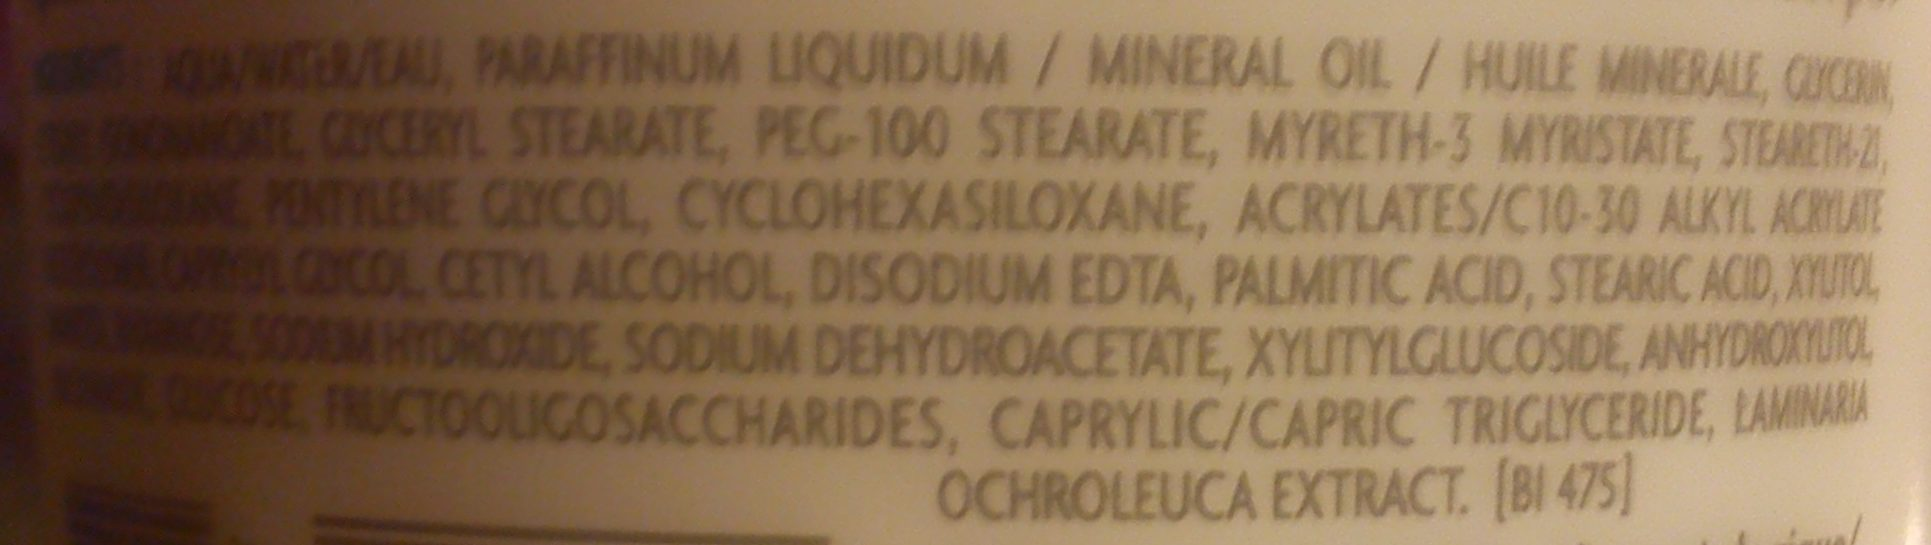 Atoderm Crème - Ingredients - fr